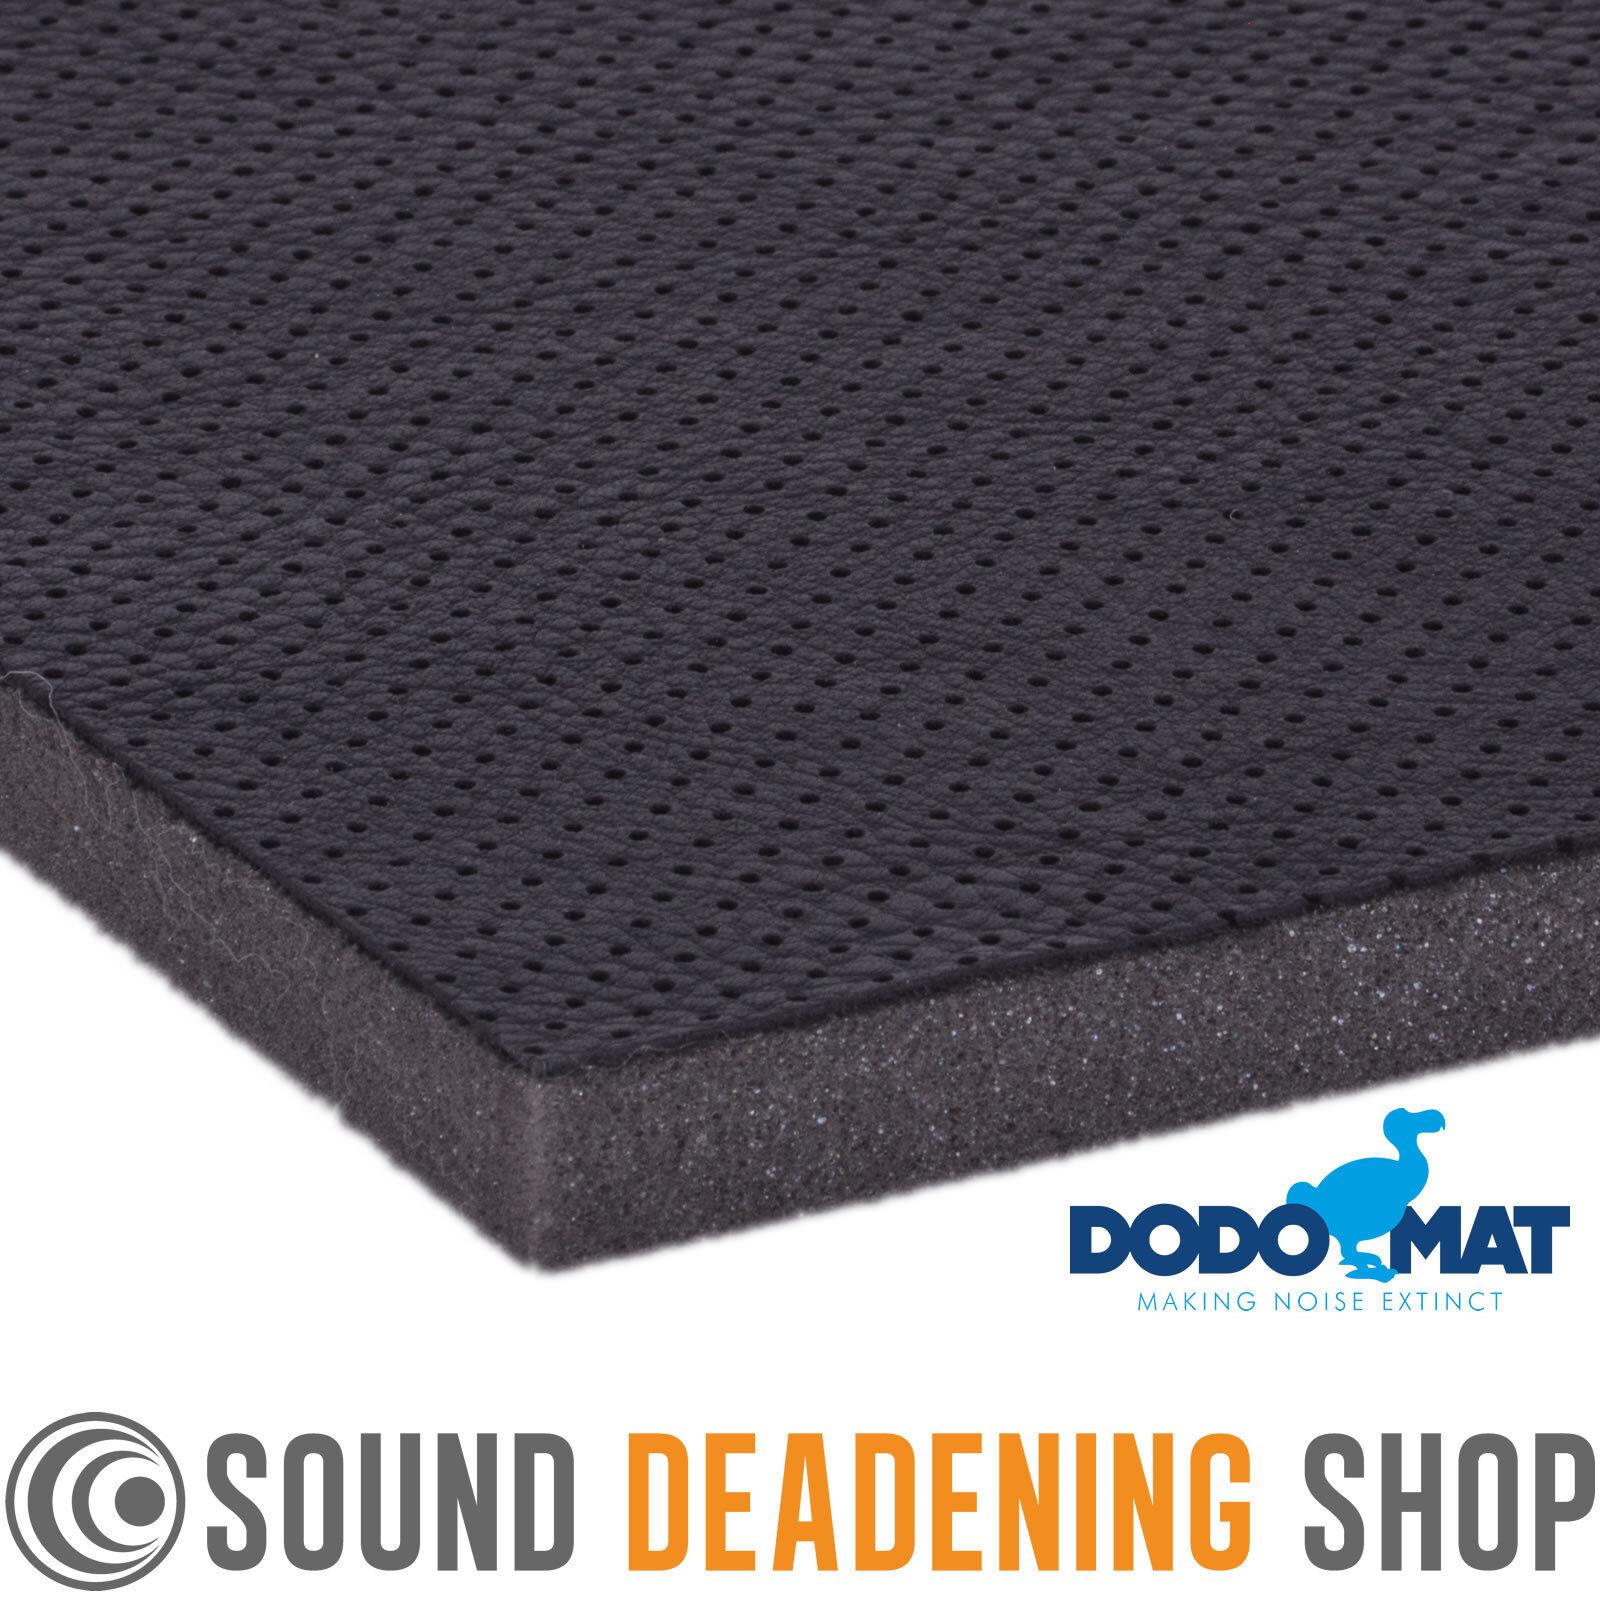 mat barrier probarrier shop sound mlv deadening dodo products pro